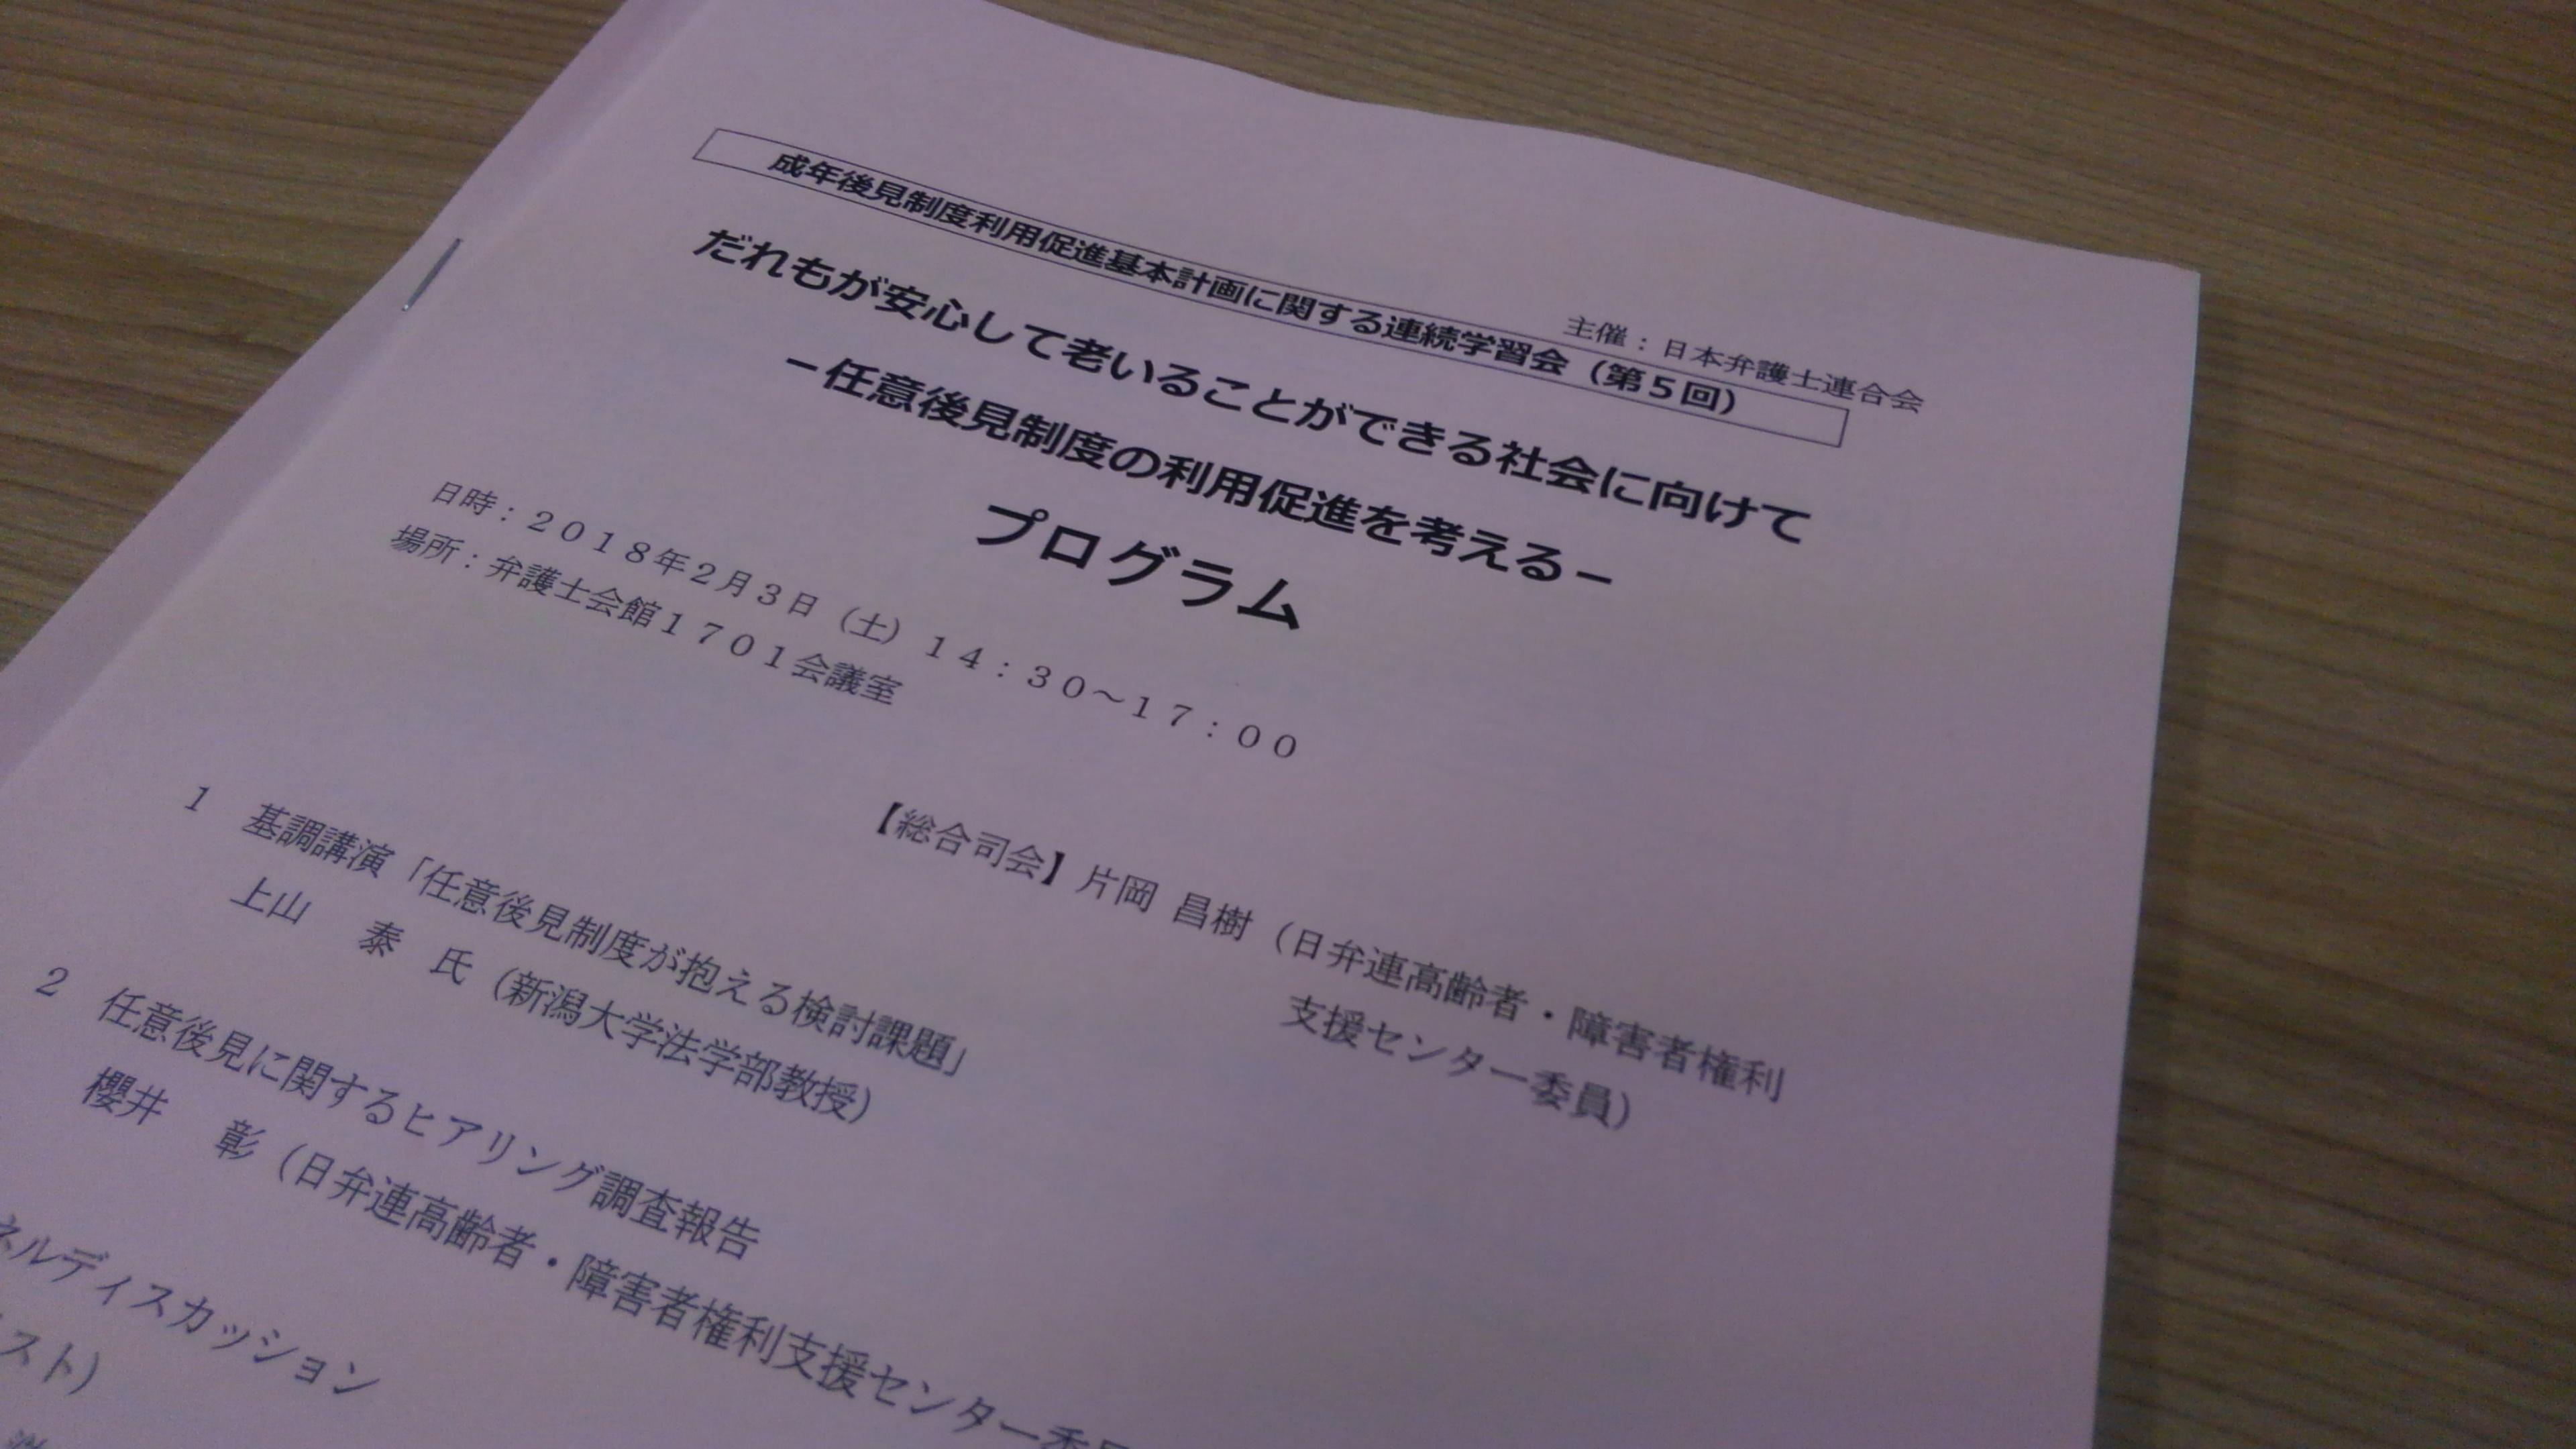 180203 成年後見制度利用促進法に関する連続勉強会